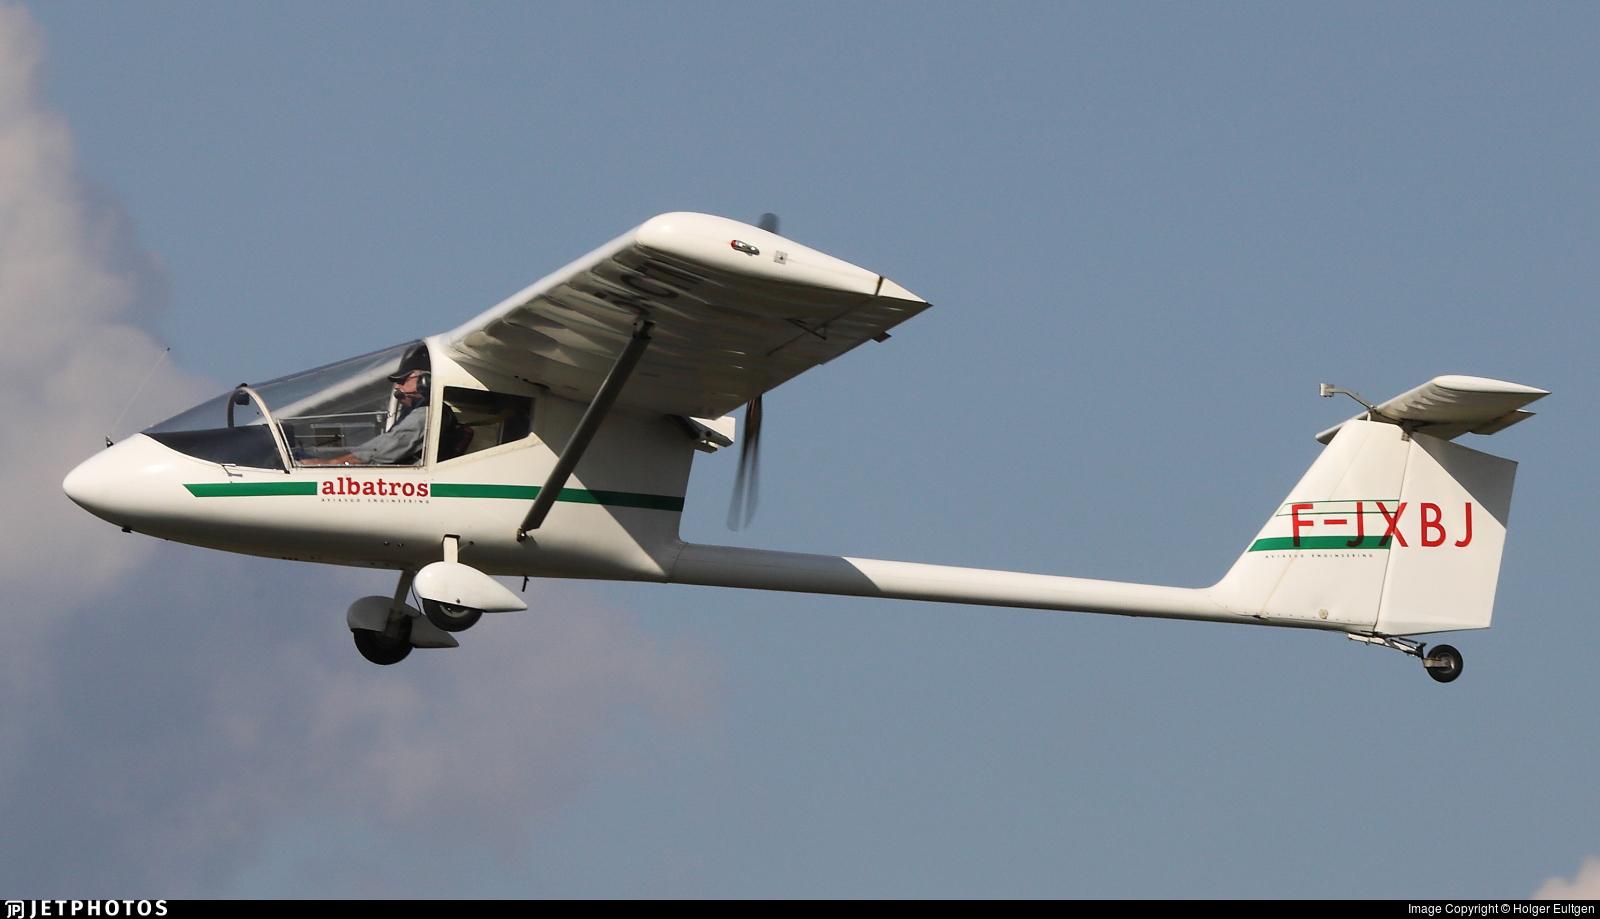 F-JXBJ - Aviasud AE209 Albatros - Private